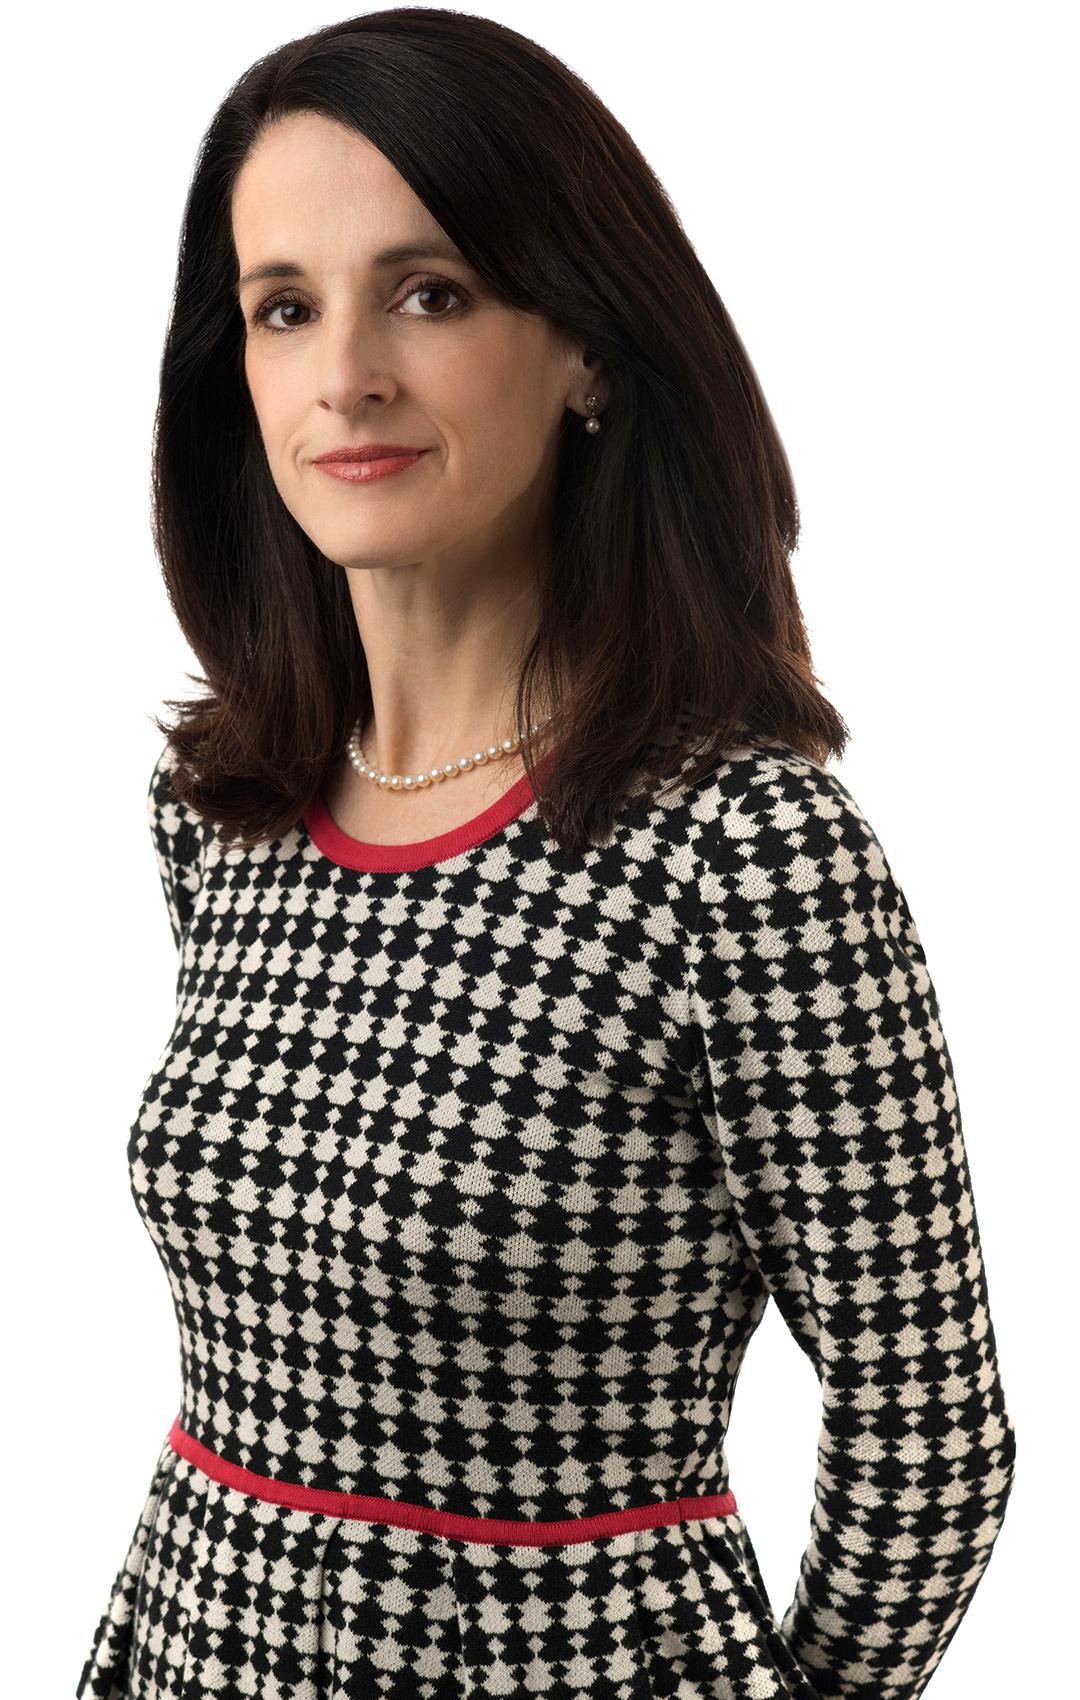 Norah C. Rogers